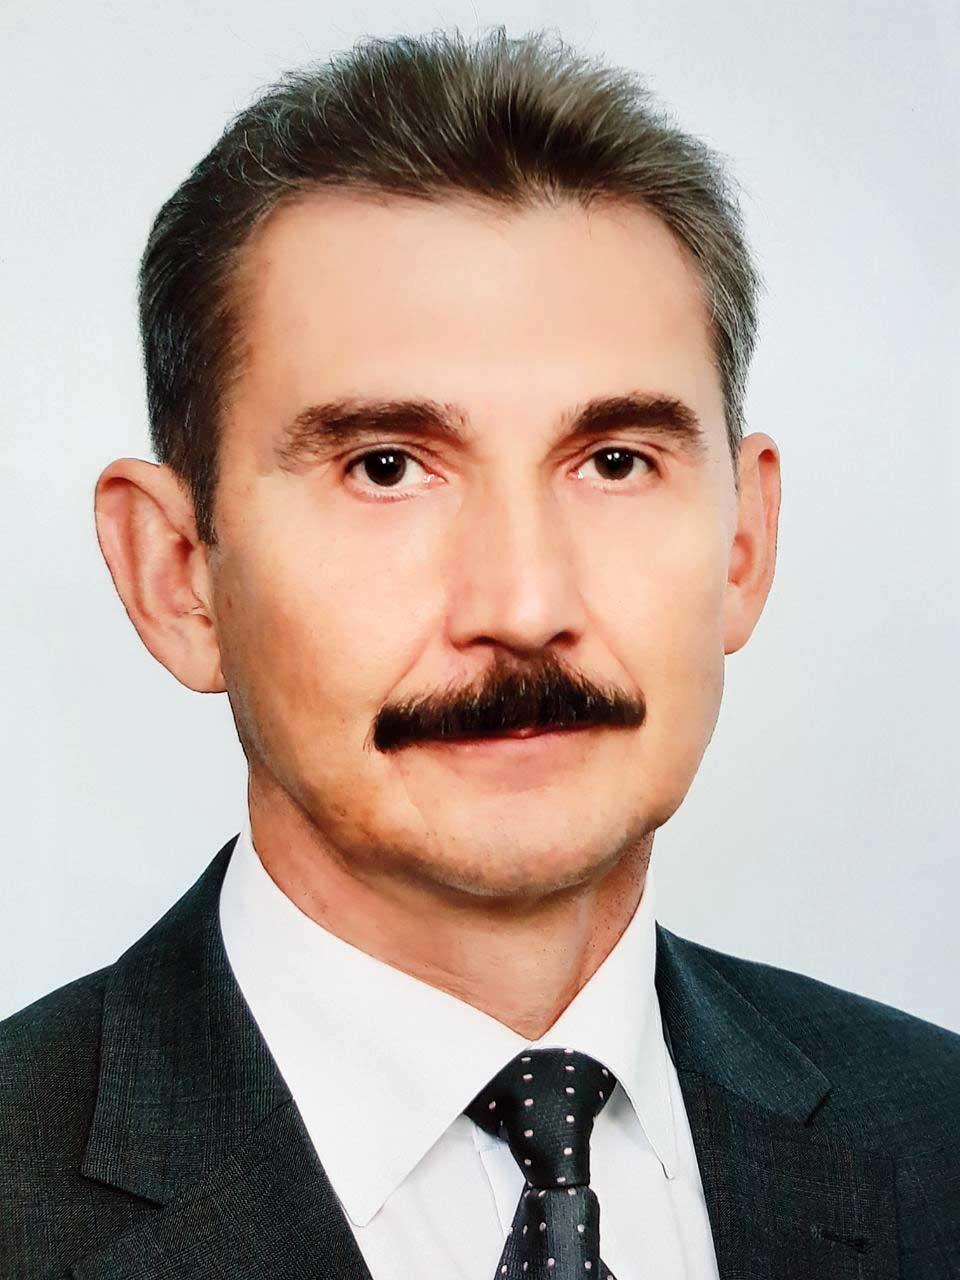 Хохряков Борис Георгиевич - НПО Сибмаш